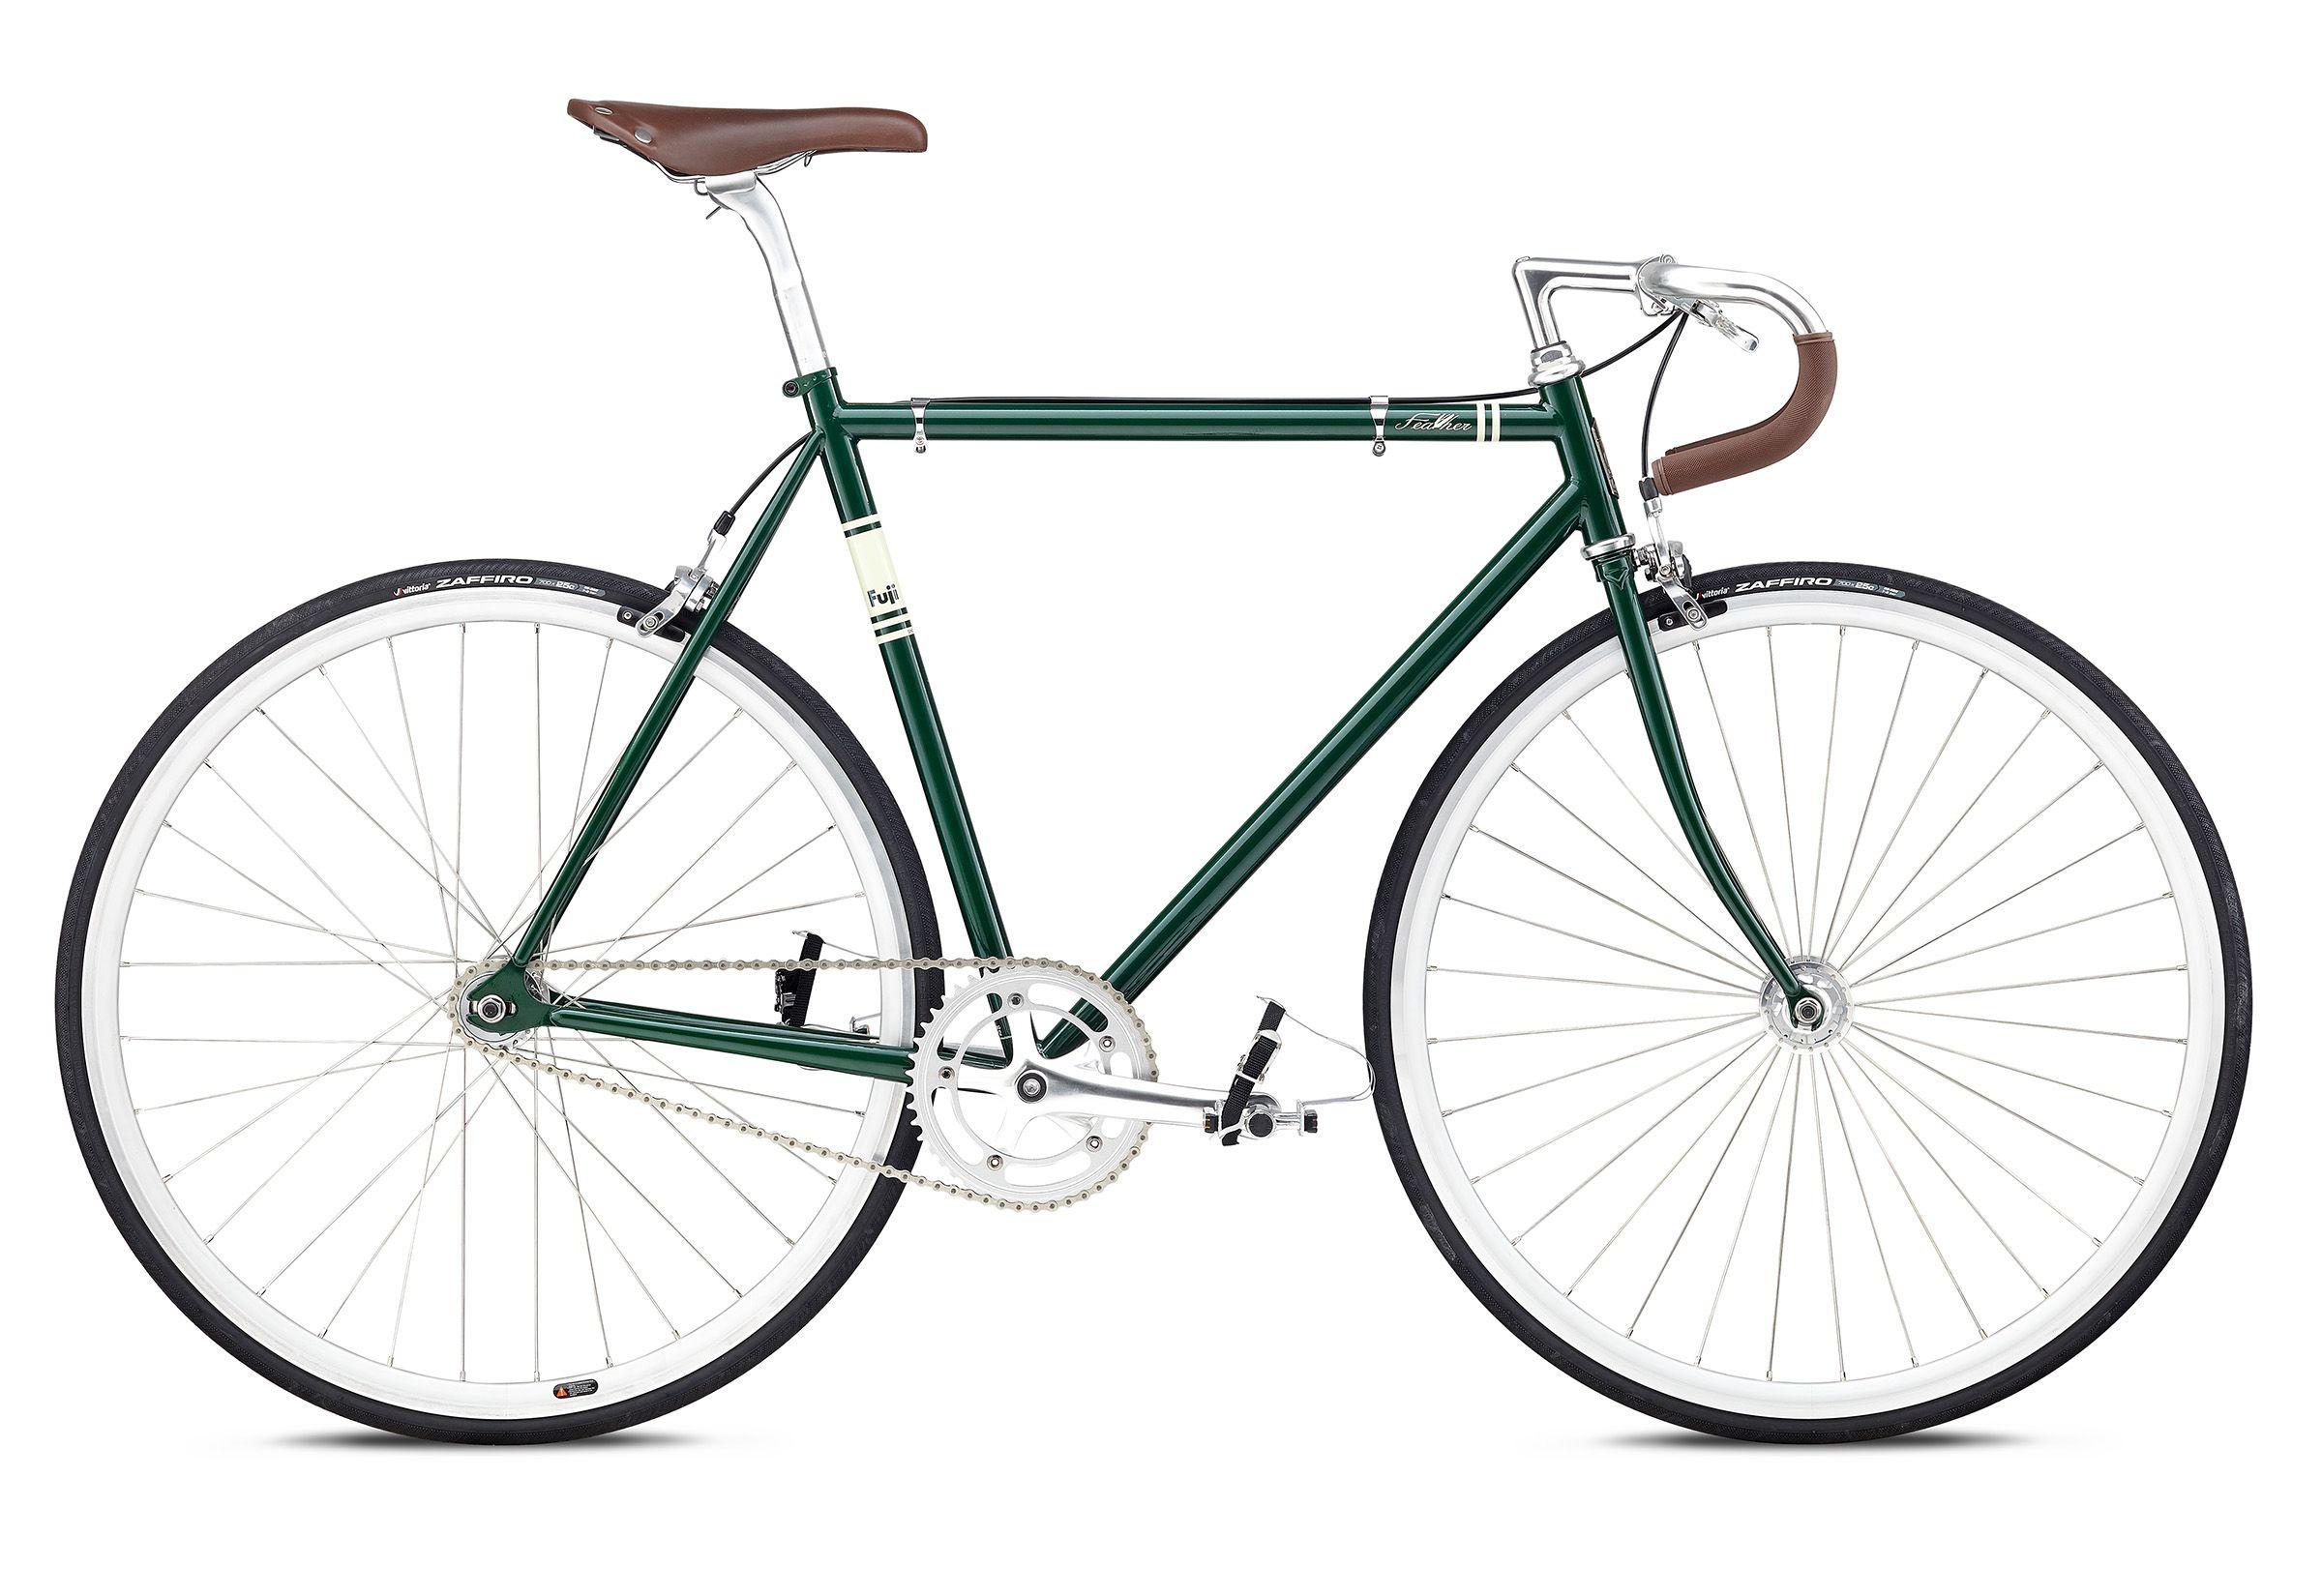 Learn More About Fuji Bikes Feather Fuji Bikes Singlespeeder Vintage Fahrrad